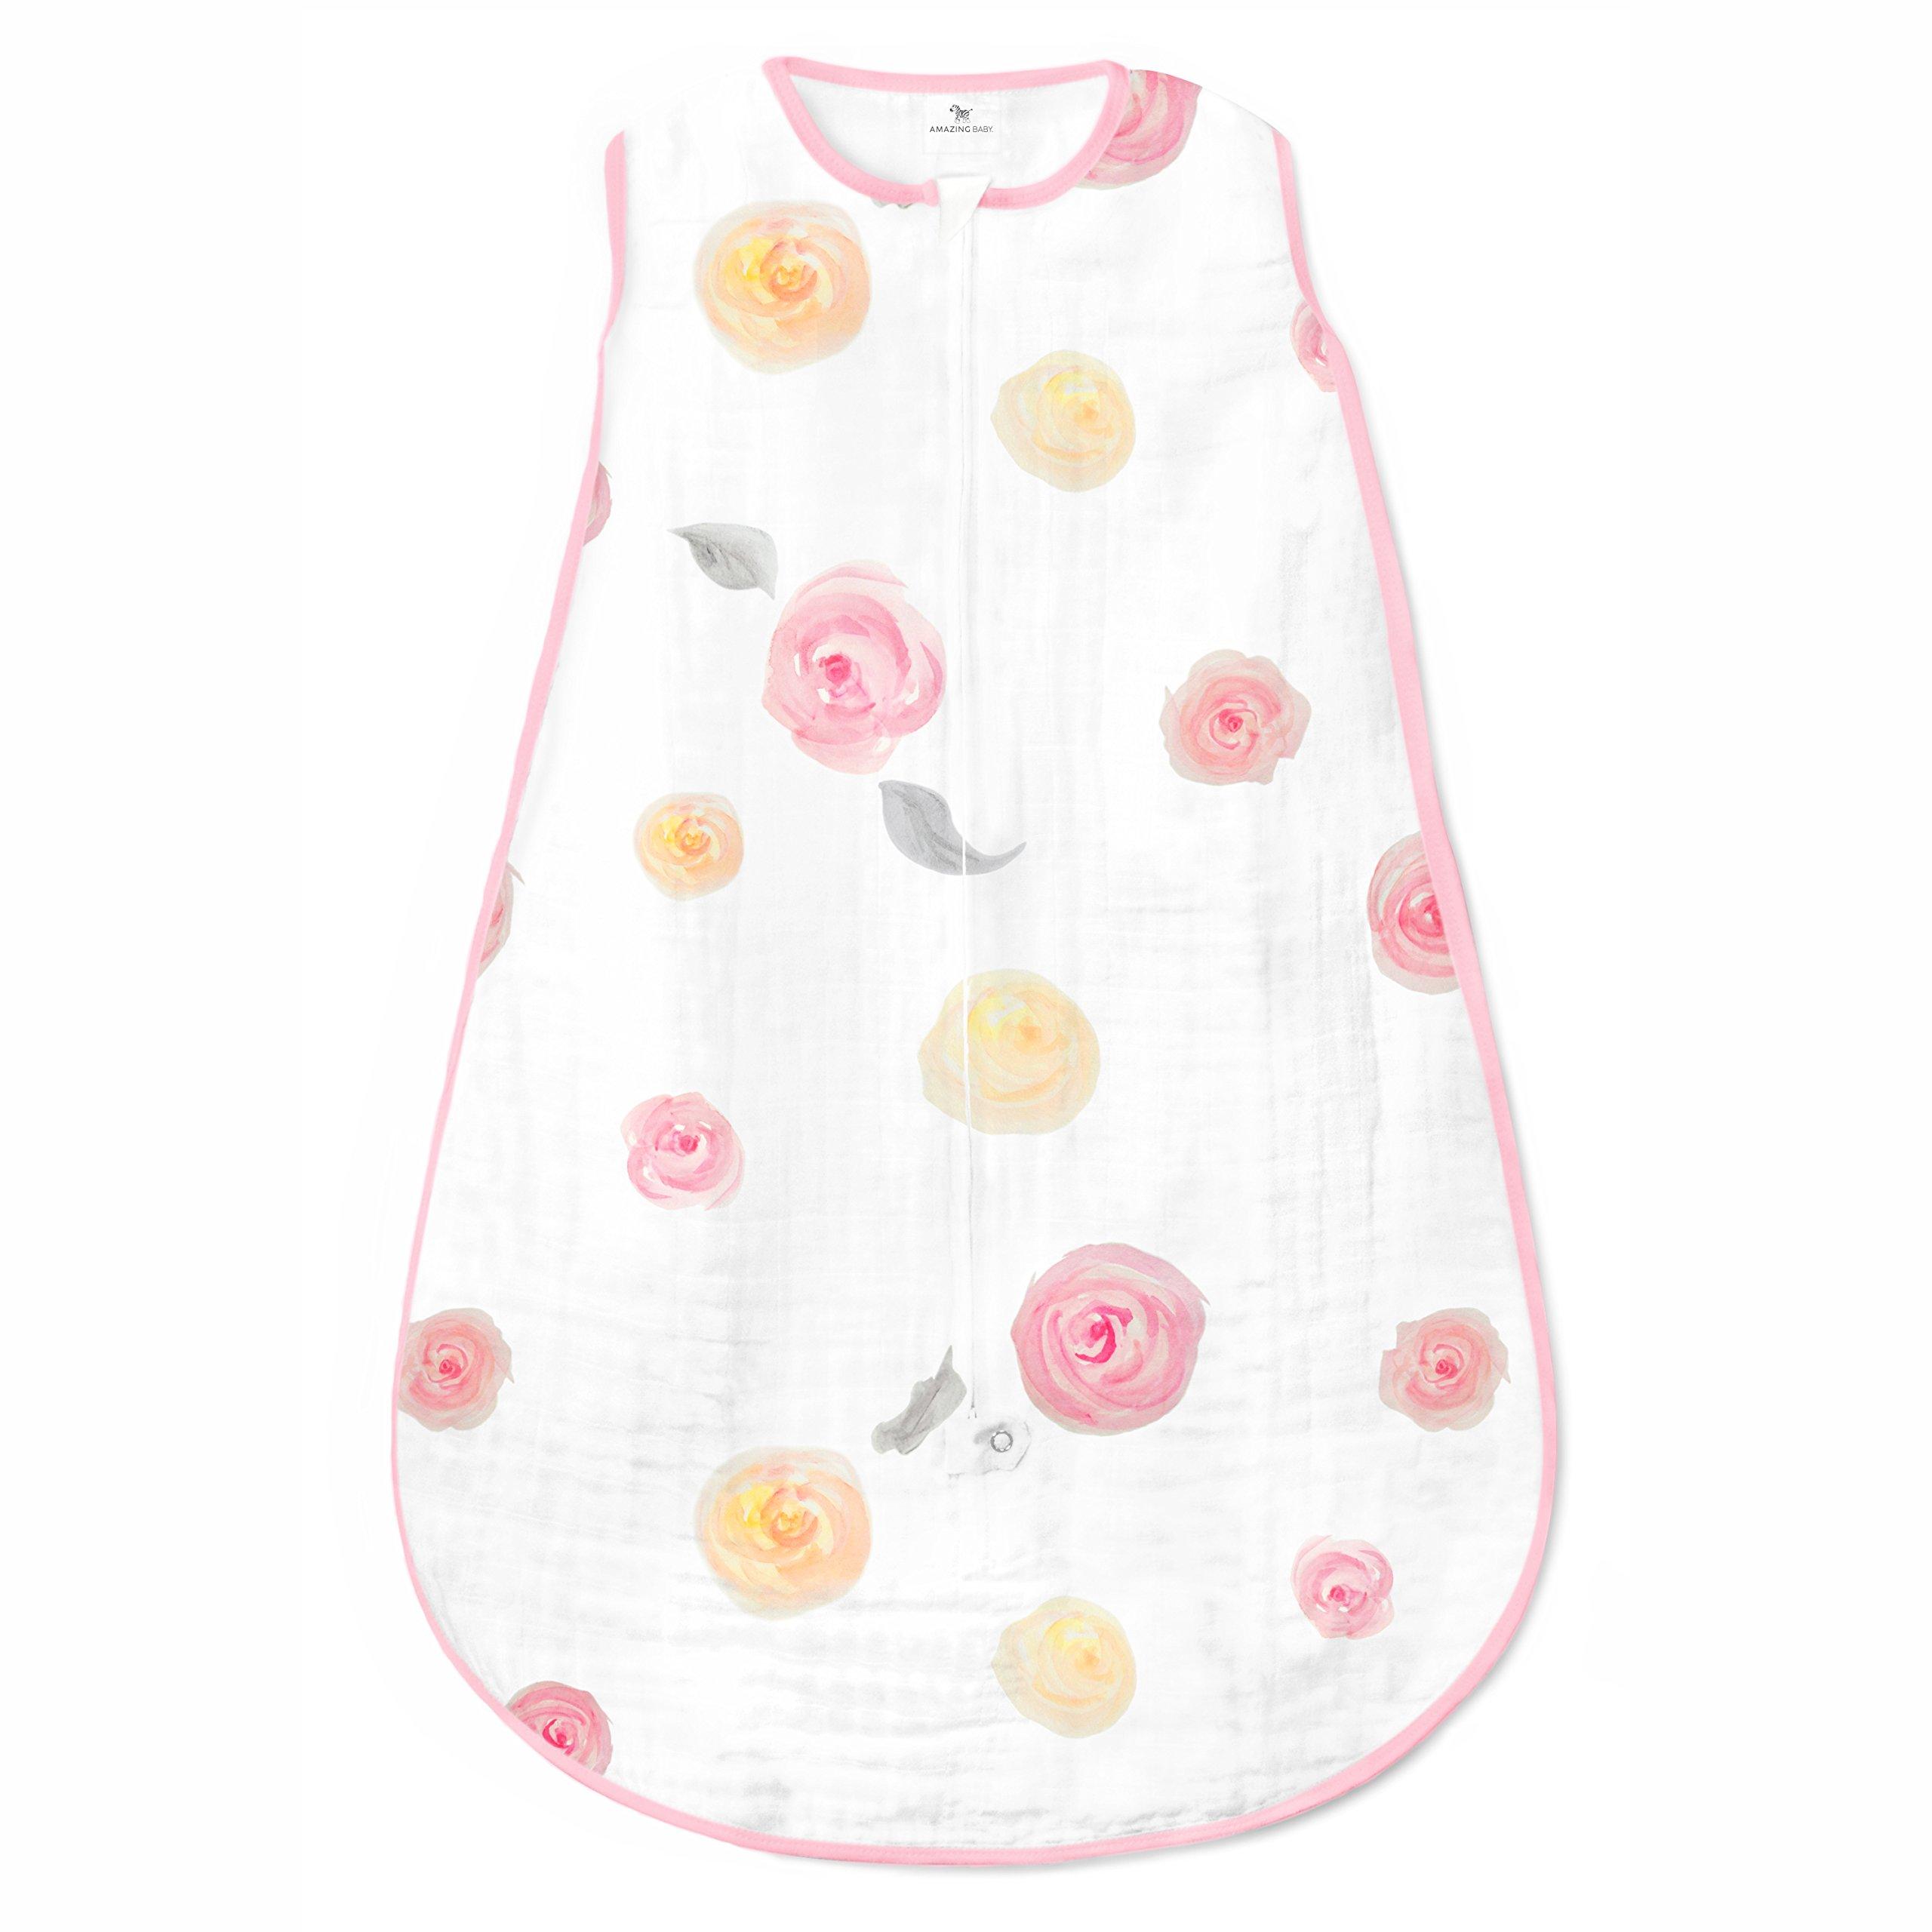 Amazing Baby Muslin Sleeping Sack with 2-Way Zipper, Watercolor Roses, Pink, Medium by Amazing Baby